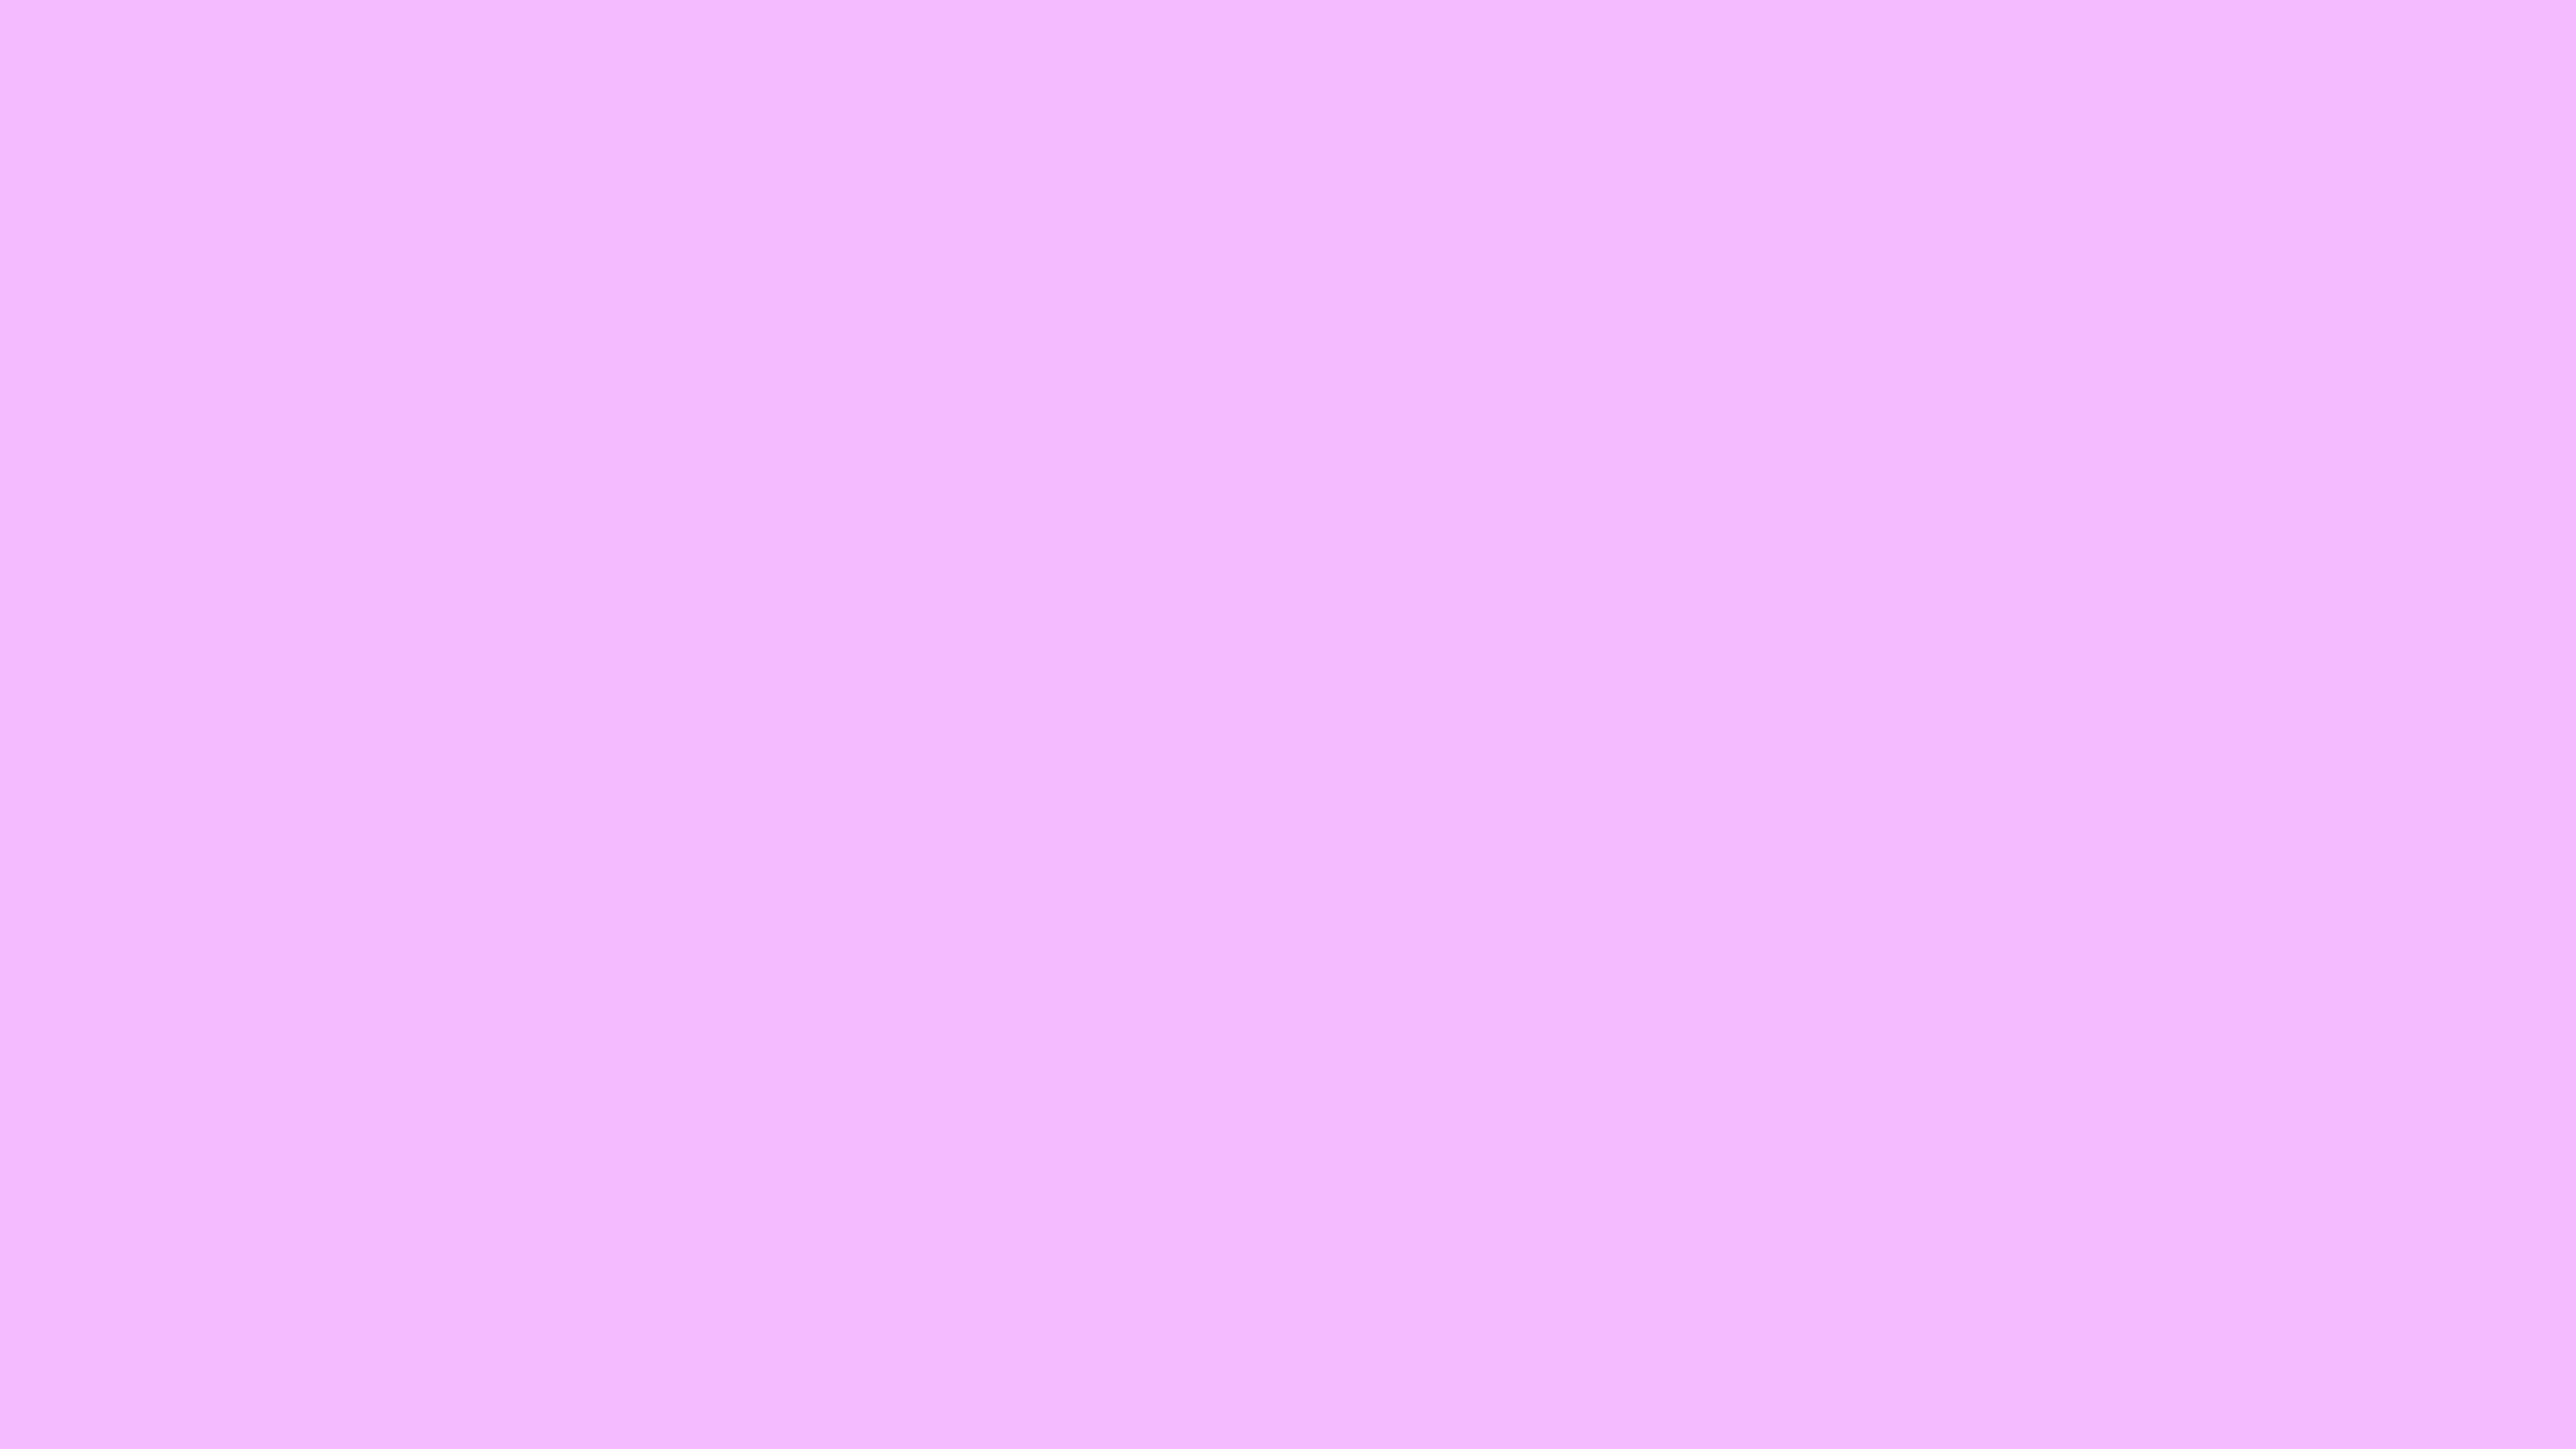 5120x2880 Brilliant Lavender Solid Color Background